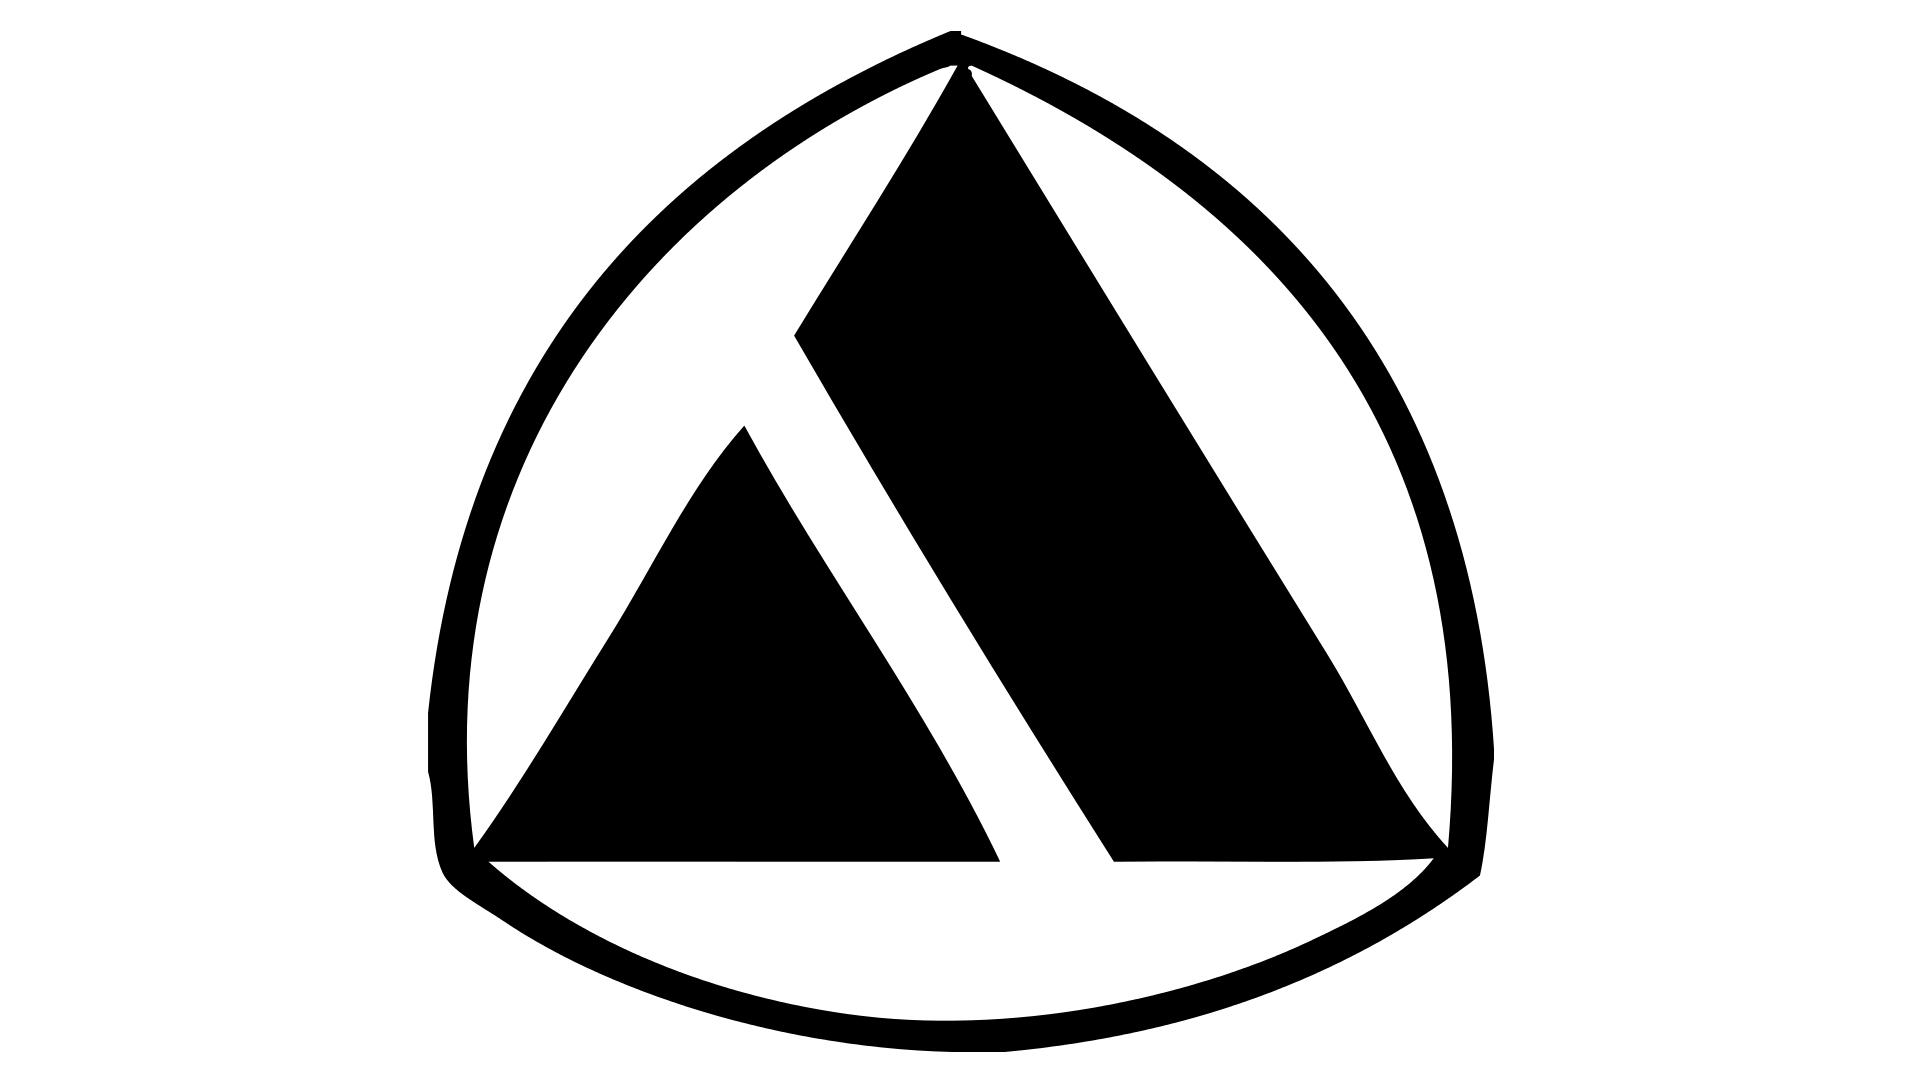 Autobianchi Logo, HD Png, Information | Carlogos.org